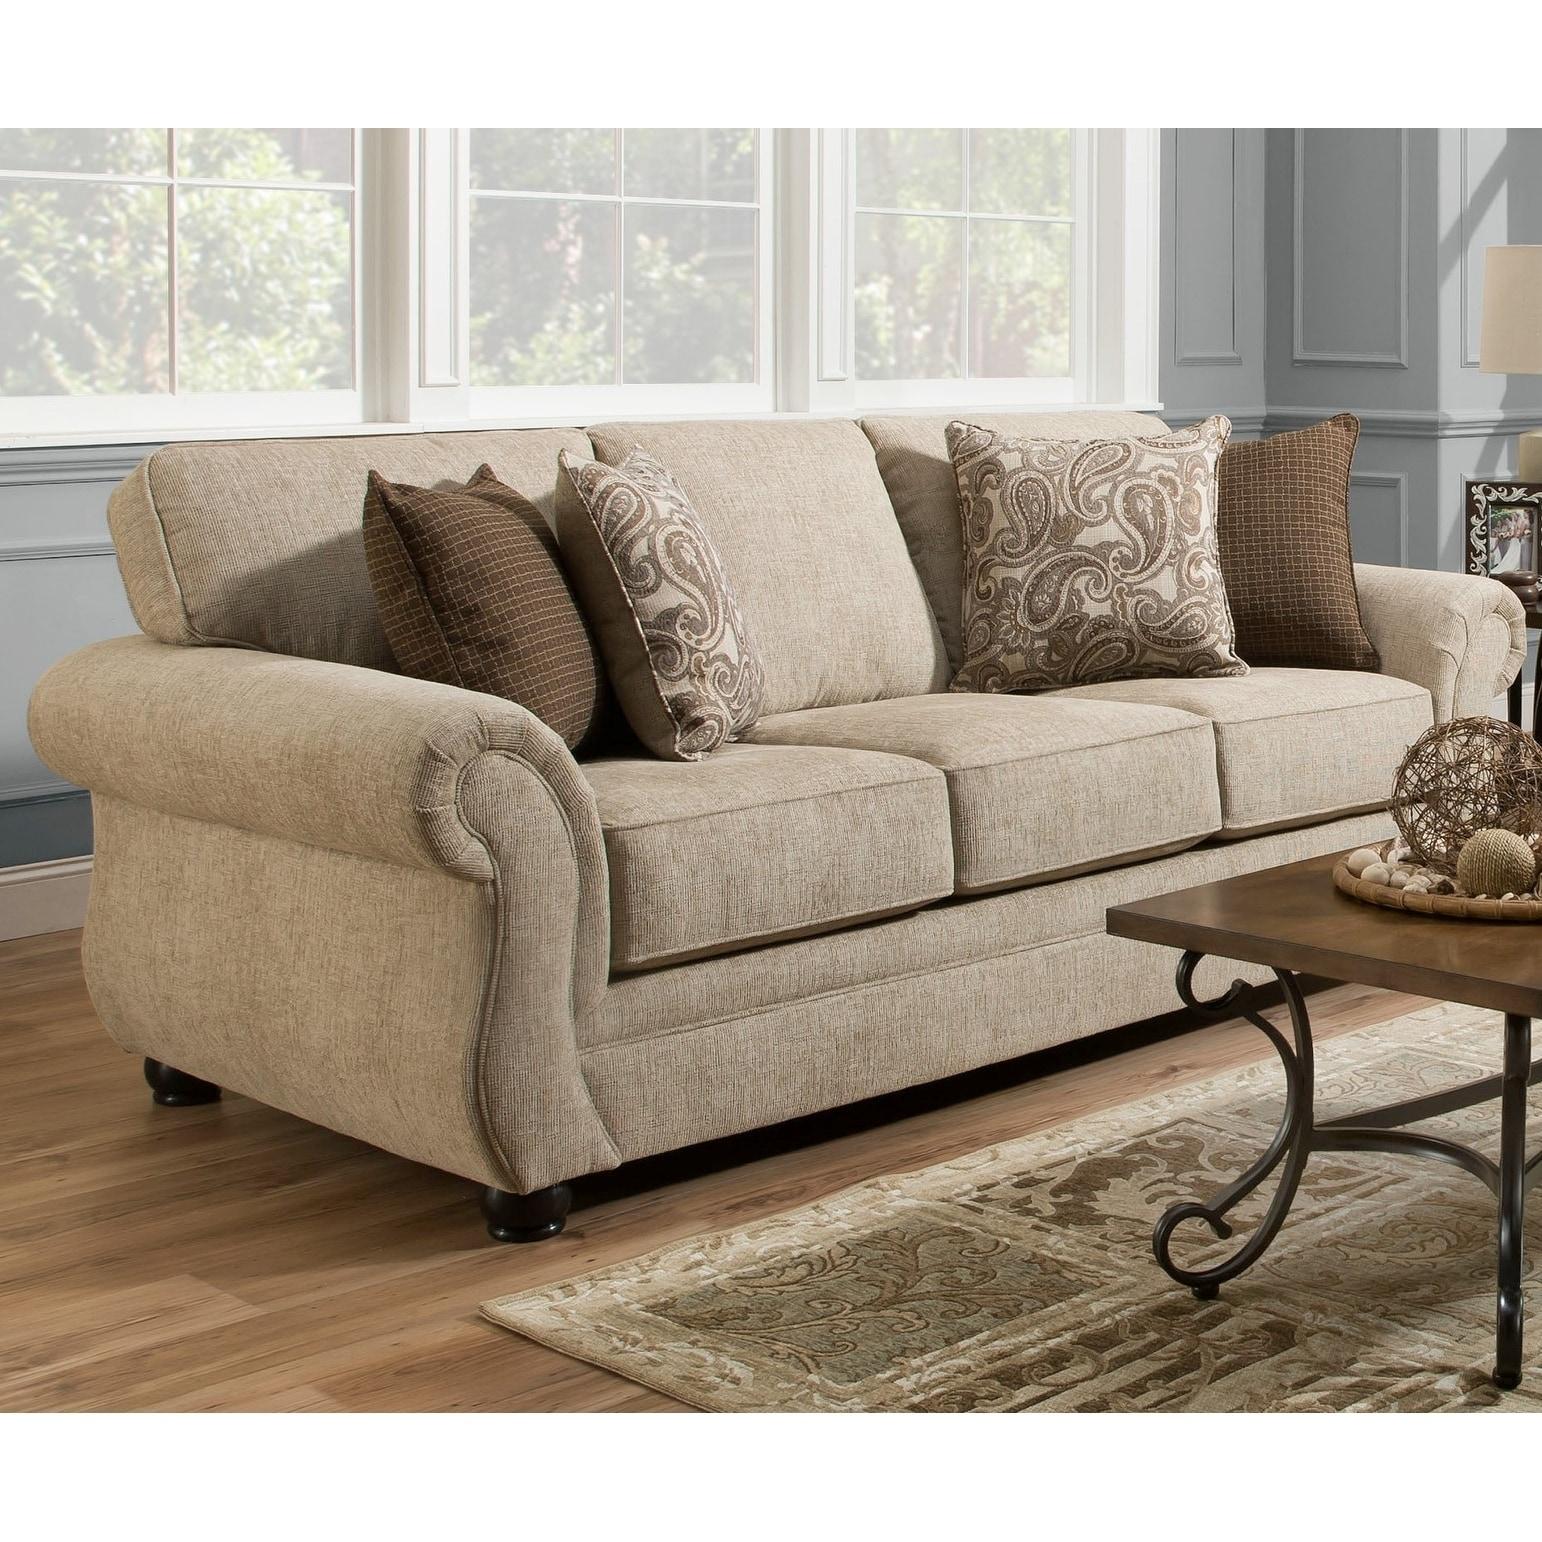 shop simmons upholstery camden parchment queen sleeper sofa free rh overstock com simmons sectional sleeper sofa simmons sleeper sofa queen